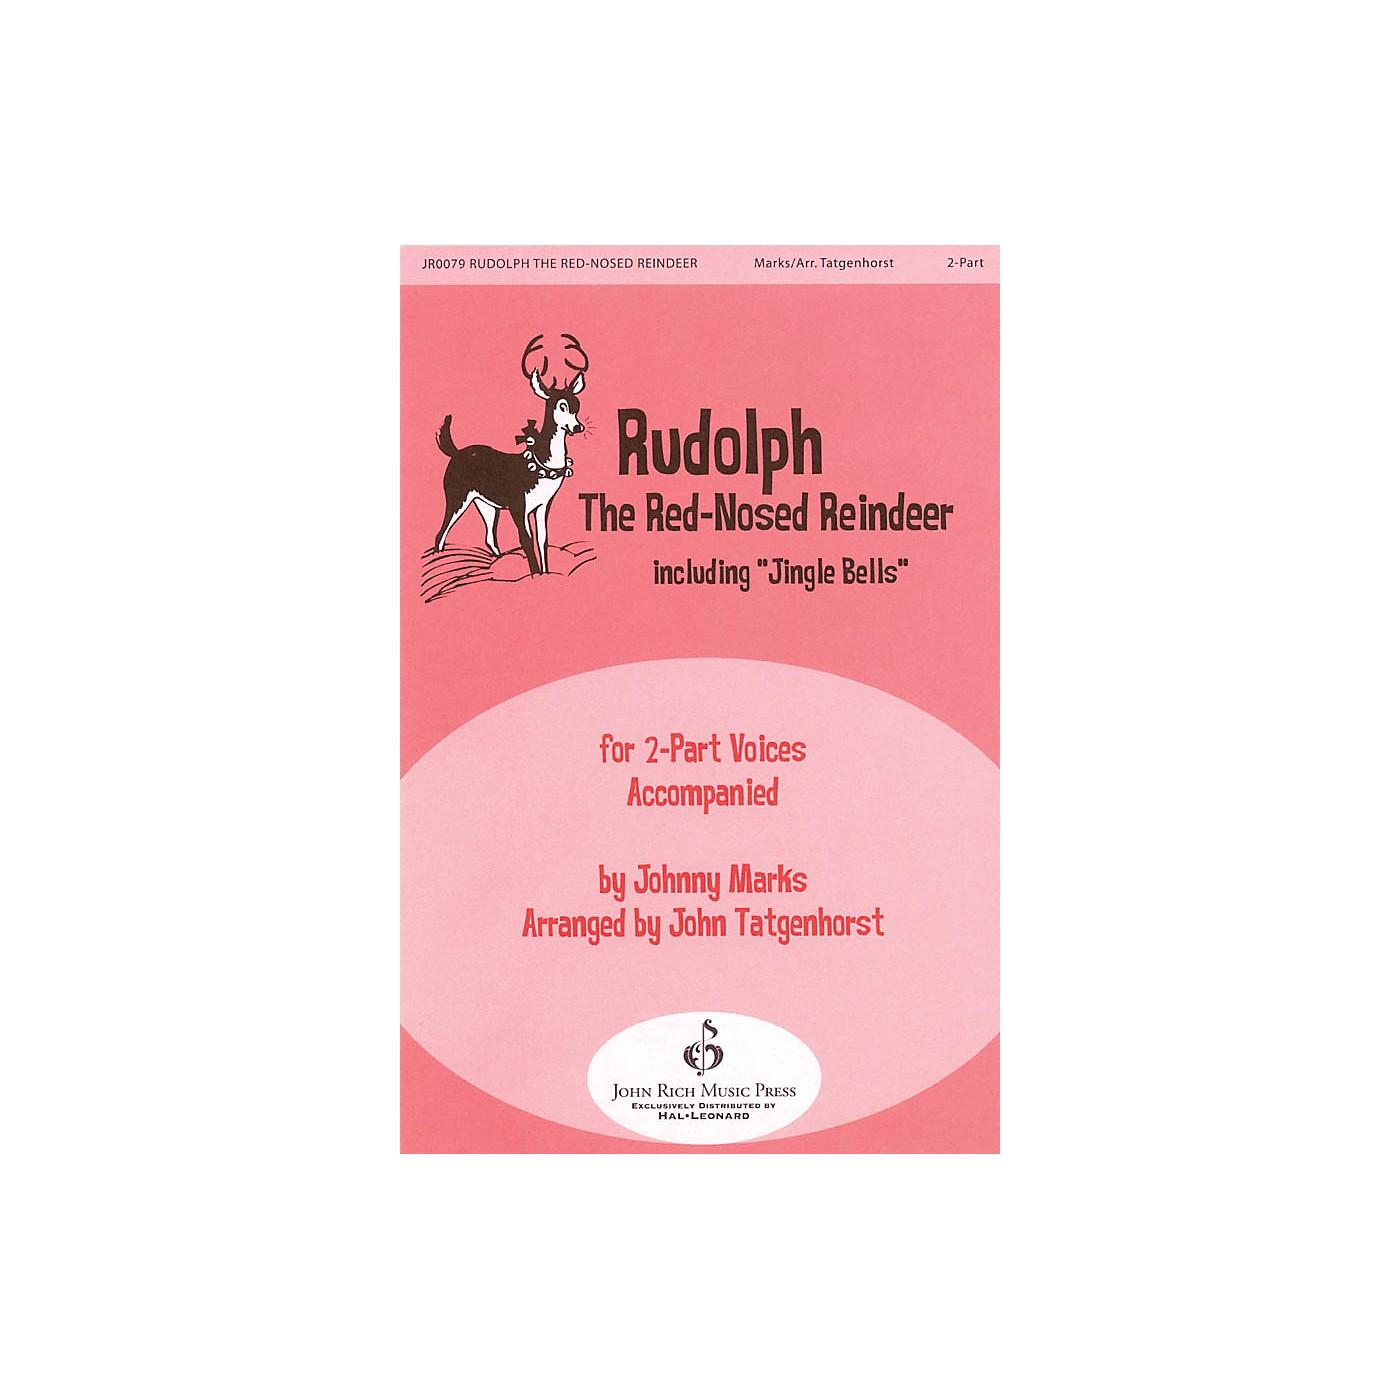 John Rich Music Press Rudolph the Red-Nosed Reindeer 2-Part arranged by John Tatgenhorst thumbnail